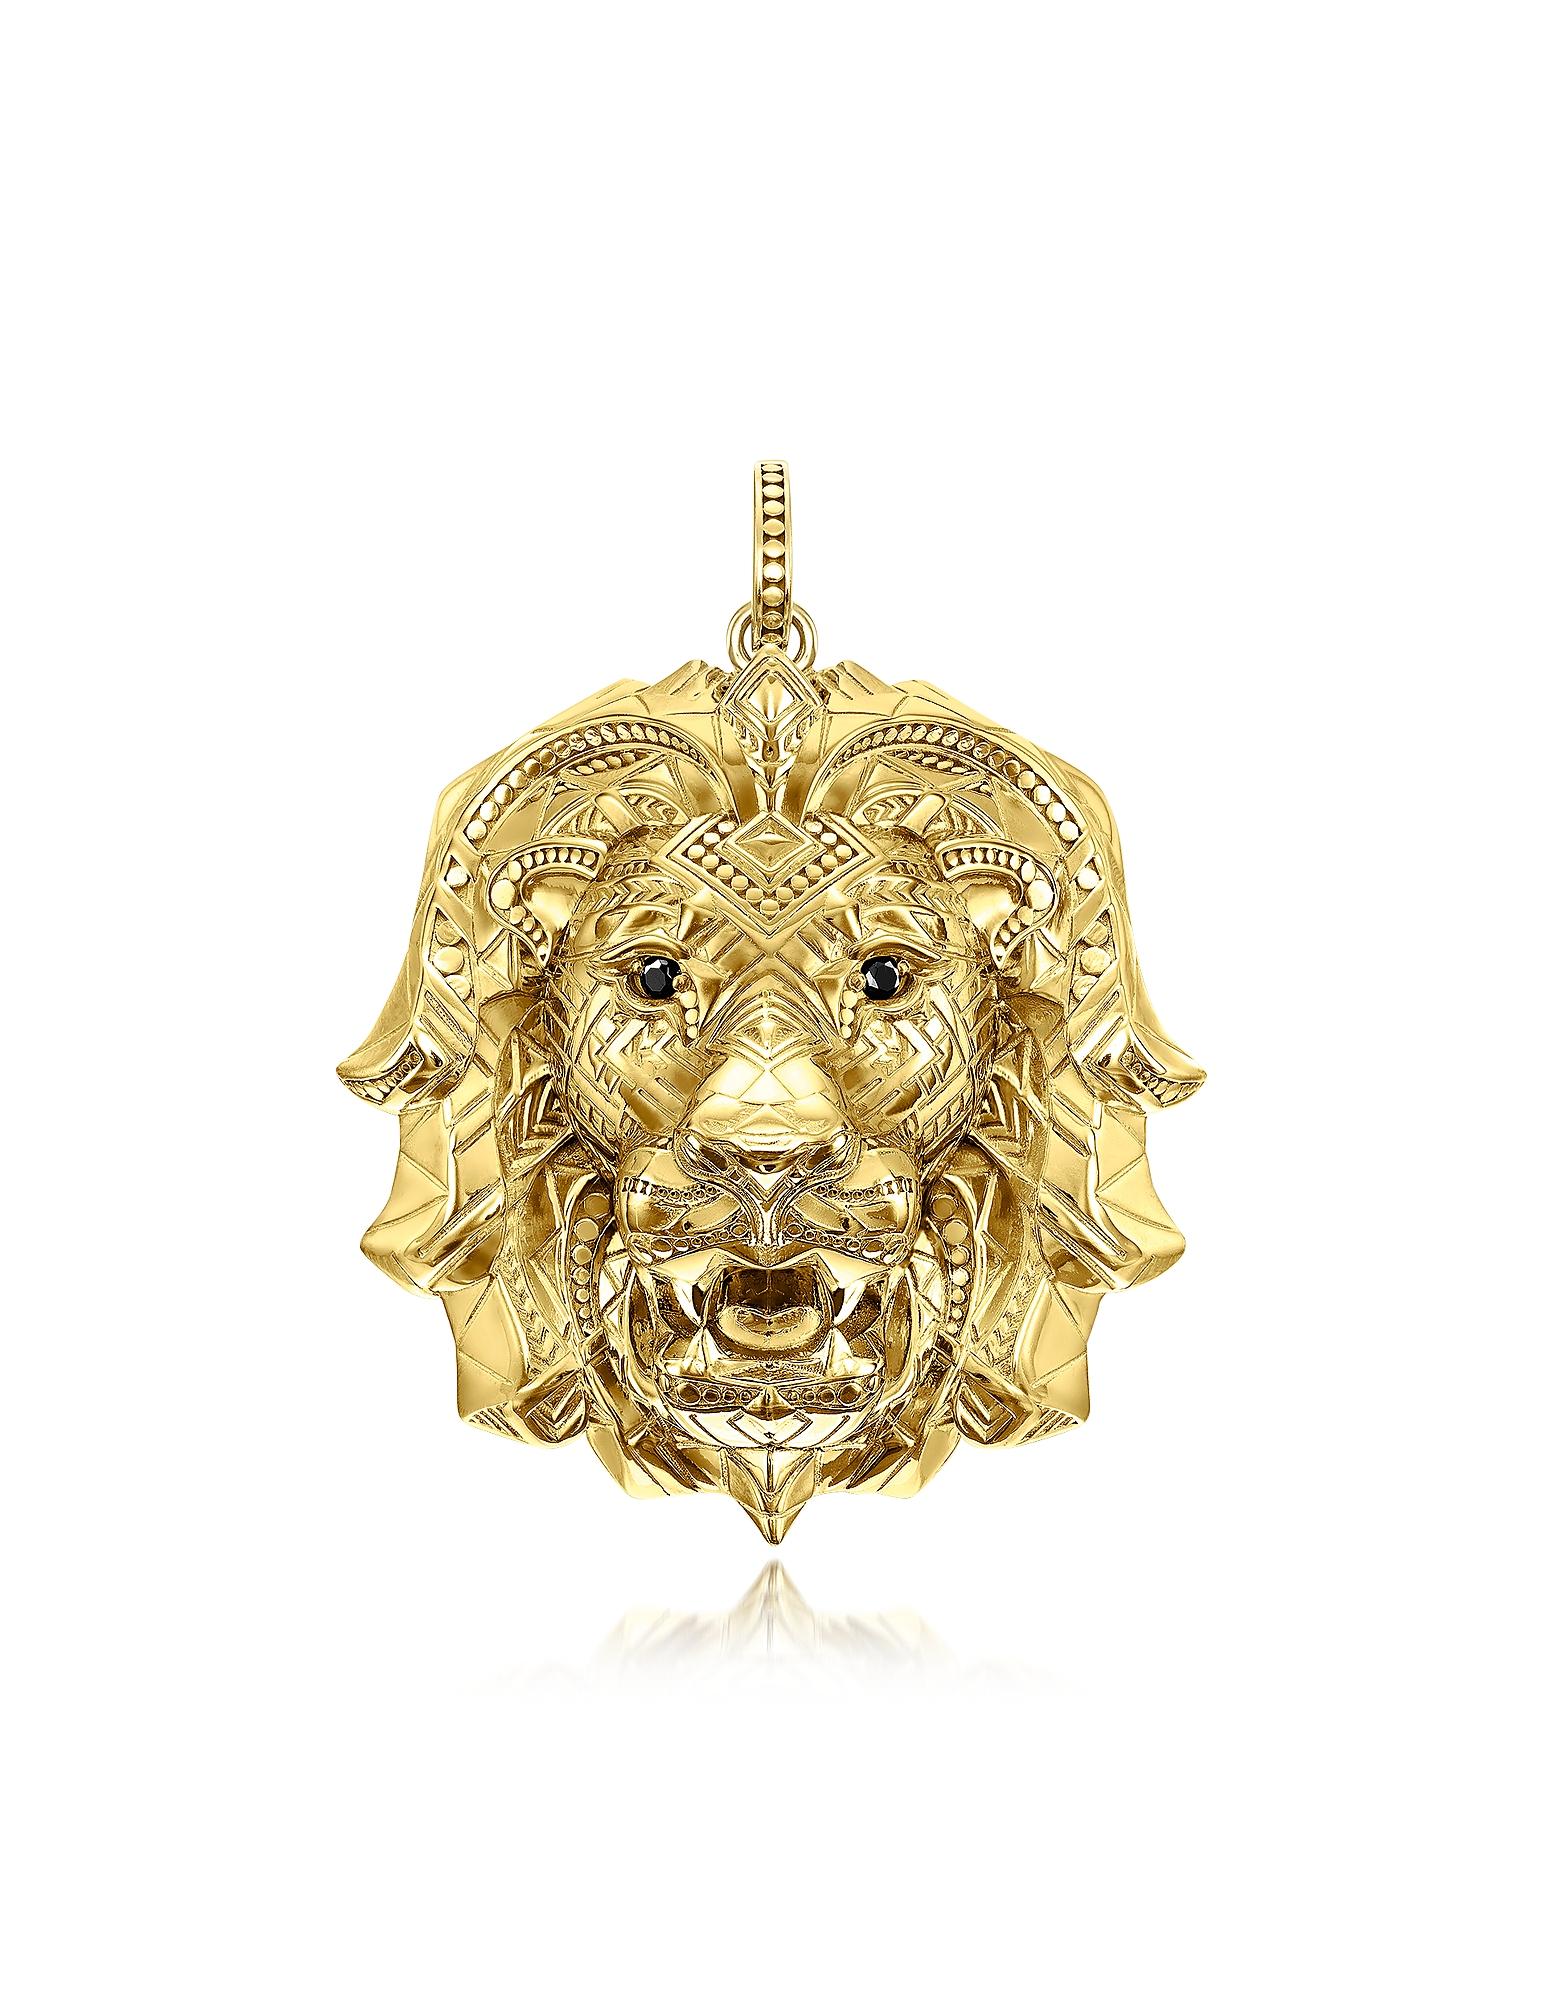 Thomas Sabo Necklaces, 925 Sterling Silver & 18k Yellow Gold Lion Pendant w/Black Zirconia